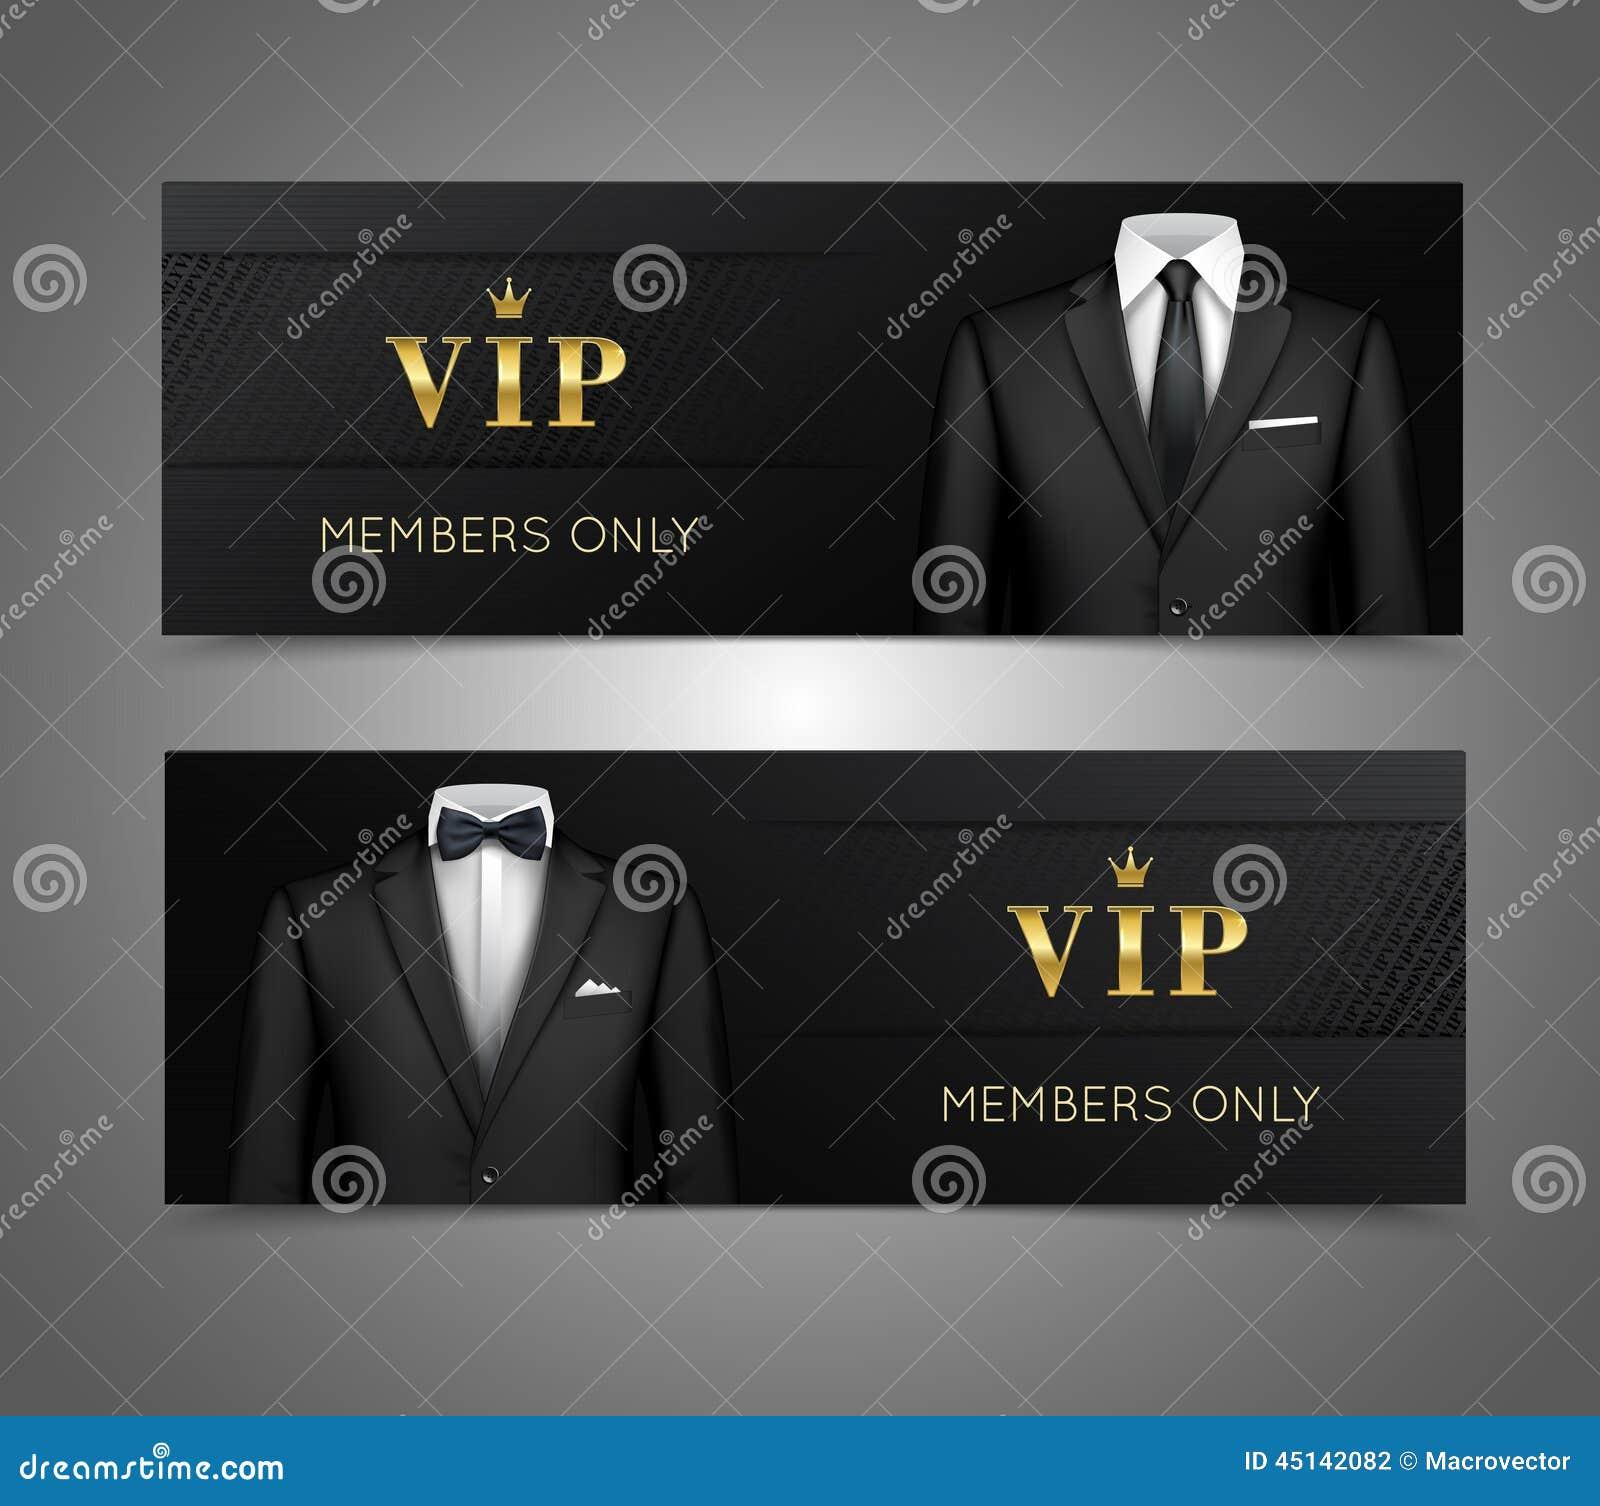 Executive Privilege Audiobook: Businessman Suit Vip Cards Horizontal Banners Stock Vector